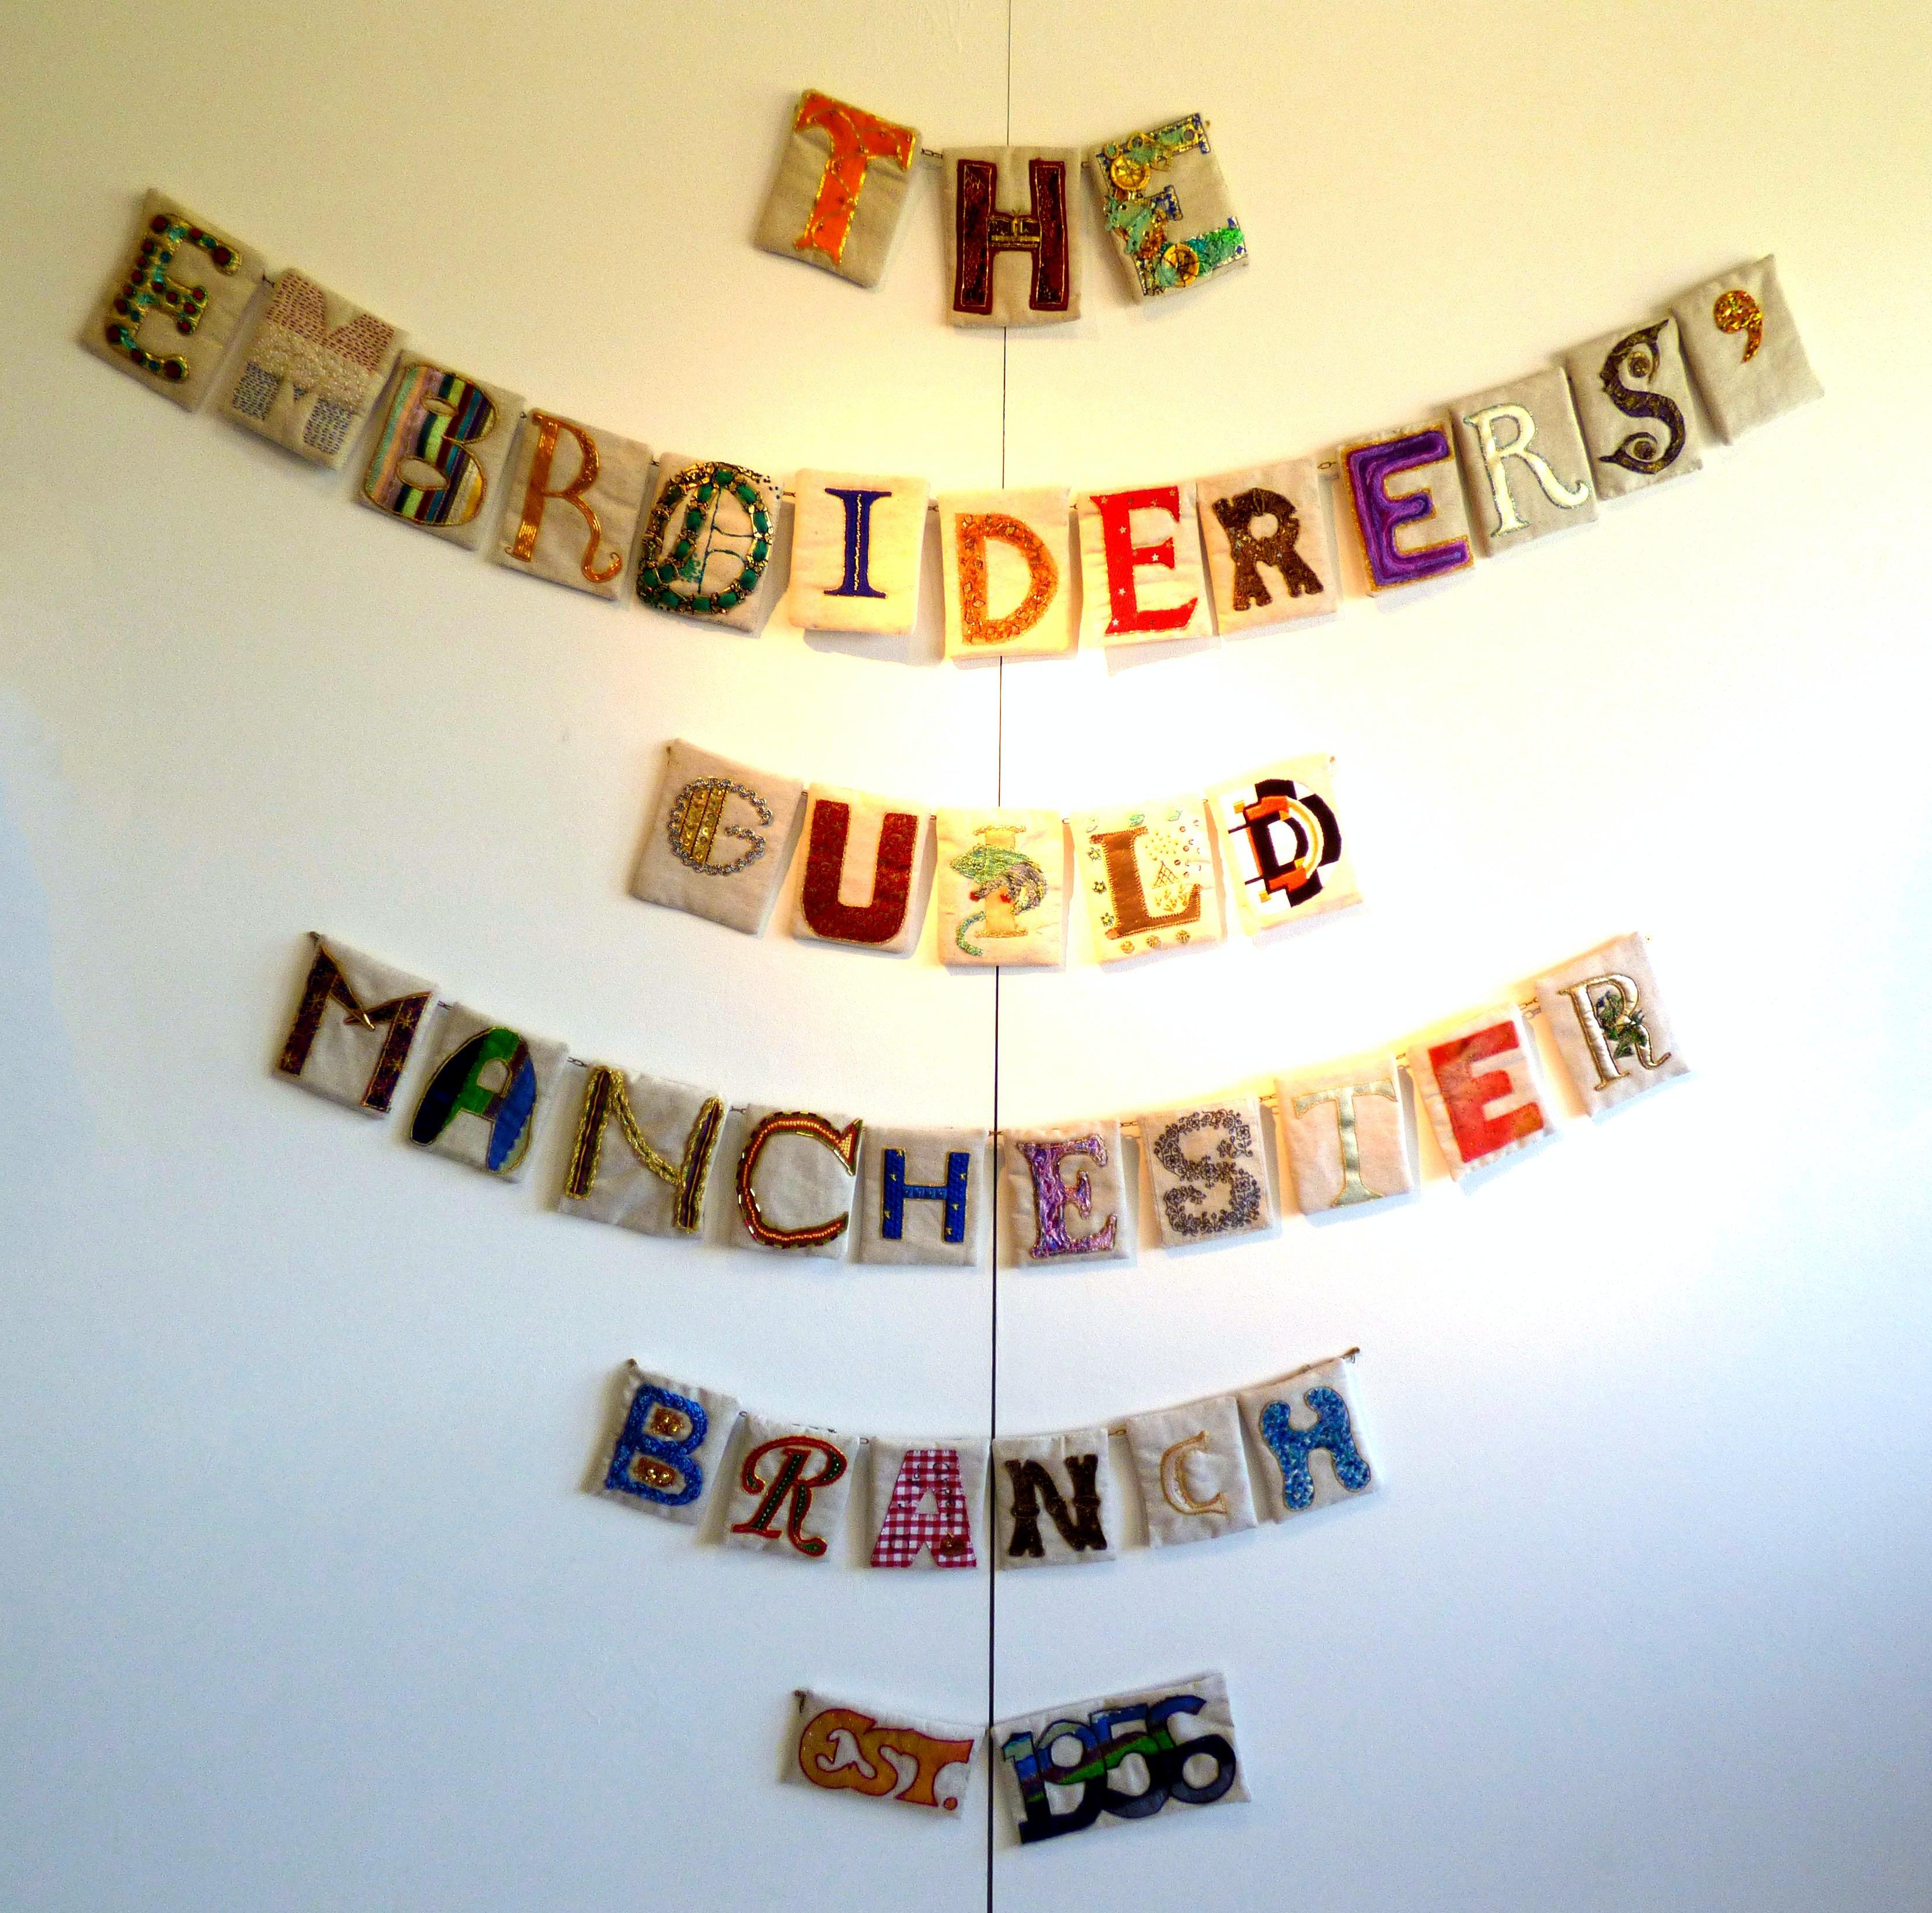 Manchester EG branch letters, group work, 2006